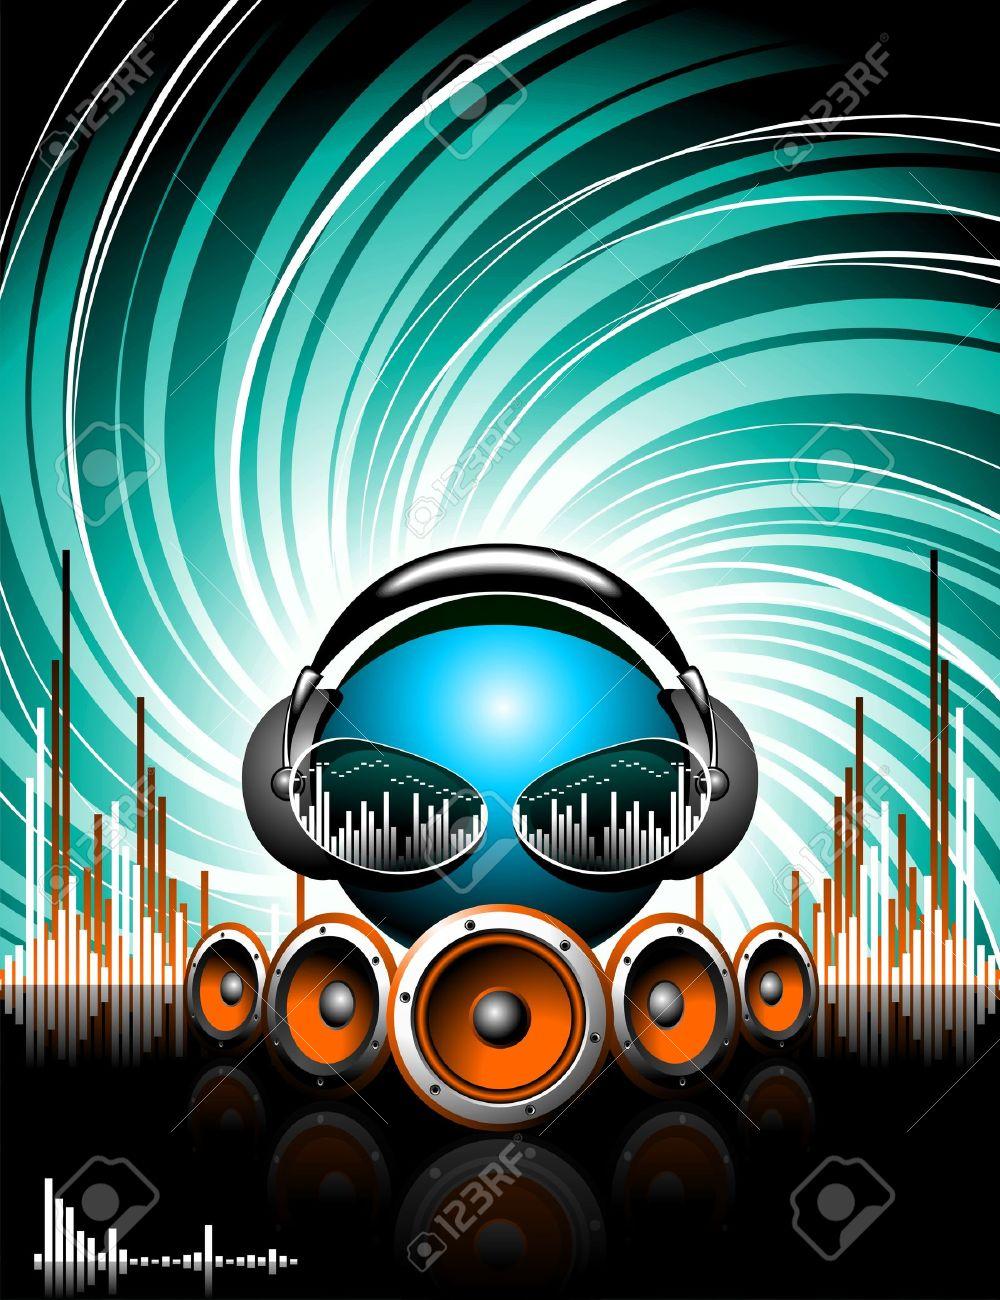 skachat-muziku-na-telefon-besplatno-trans